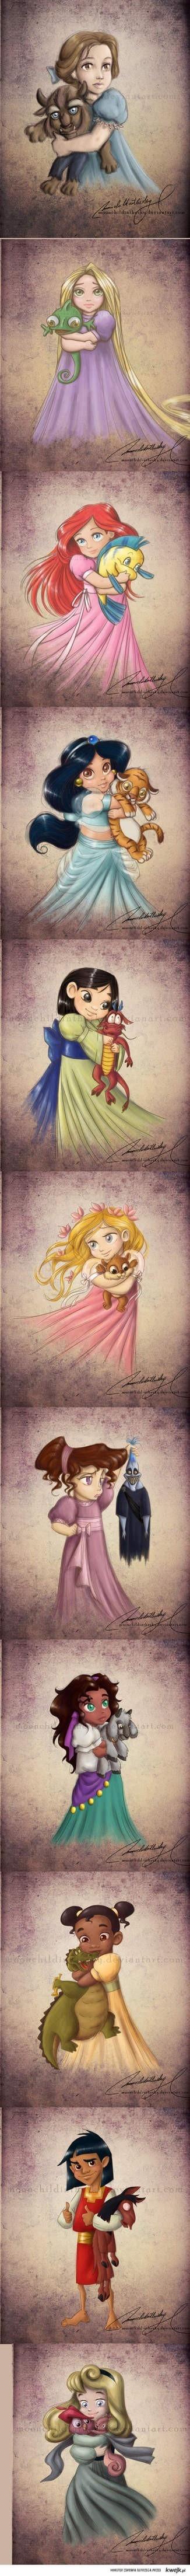 Princess Princess Princess: Disney Stuff, Disney Kids, Disney Princesses, Baby Disney, Disney 3, Baby Princess, Disney Pixar, Disney Characters